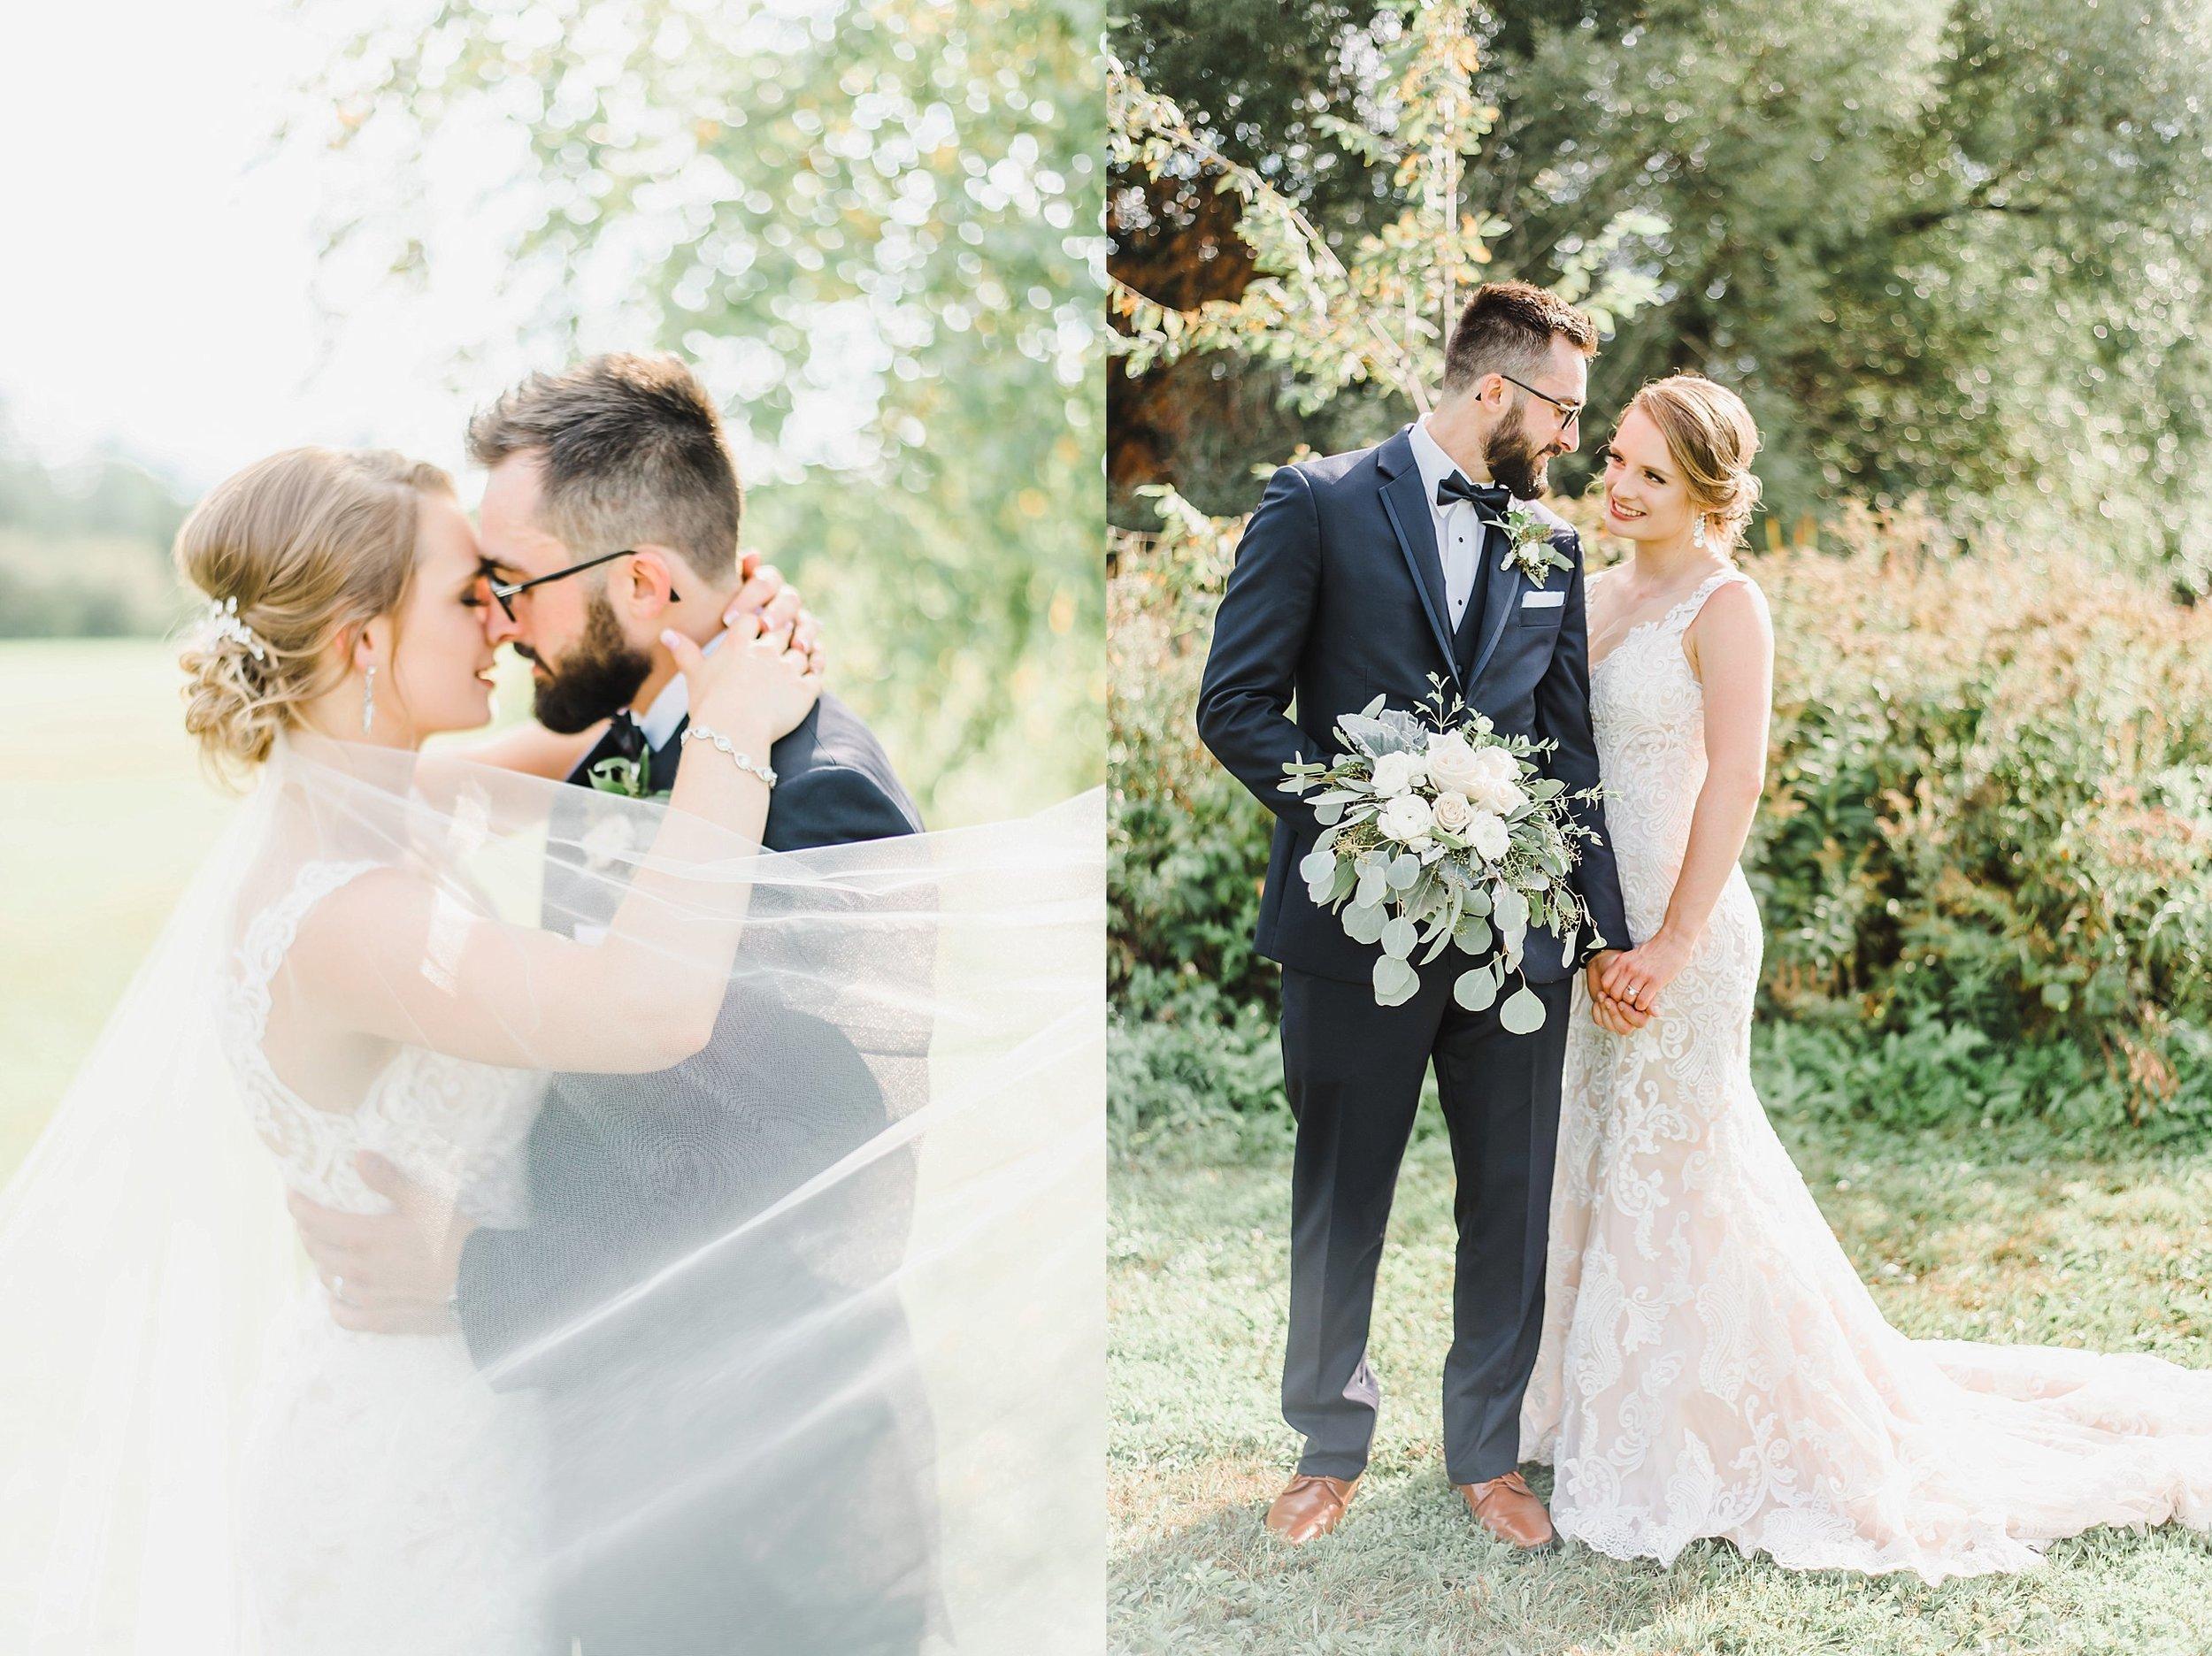 light airy indie fine art ottawa wedding photographer | Ali and Batoul Photography_1315.jpg